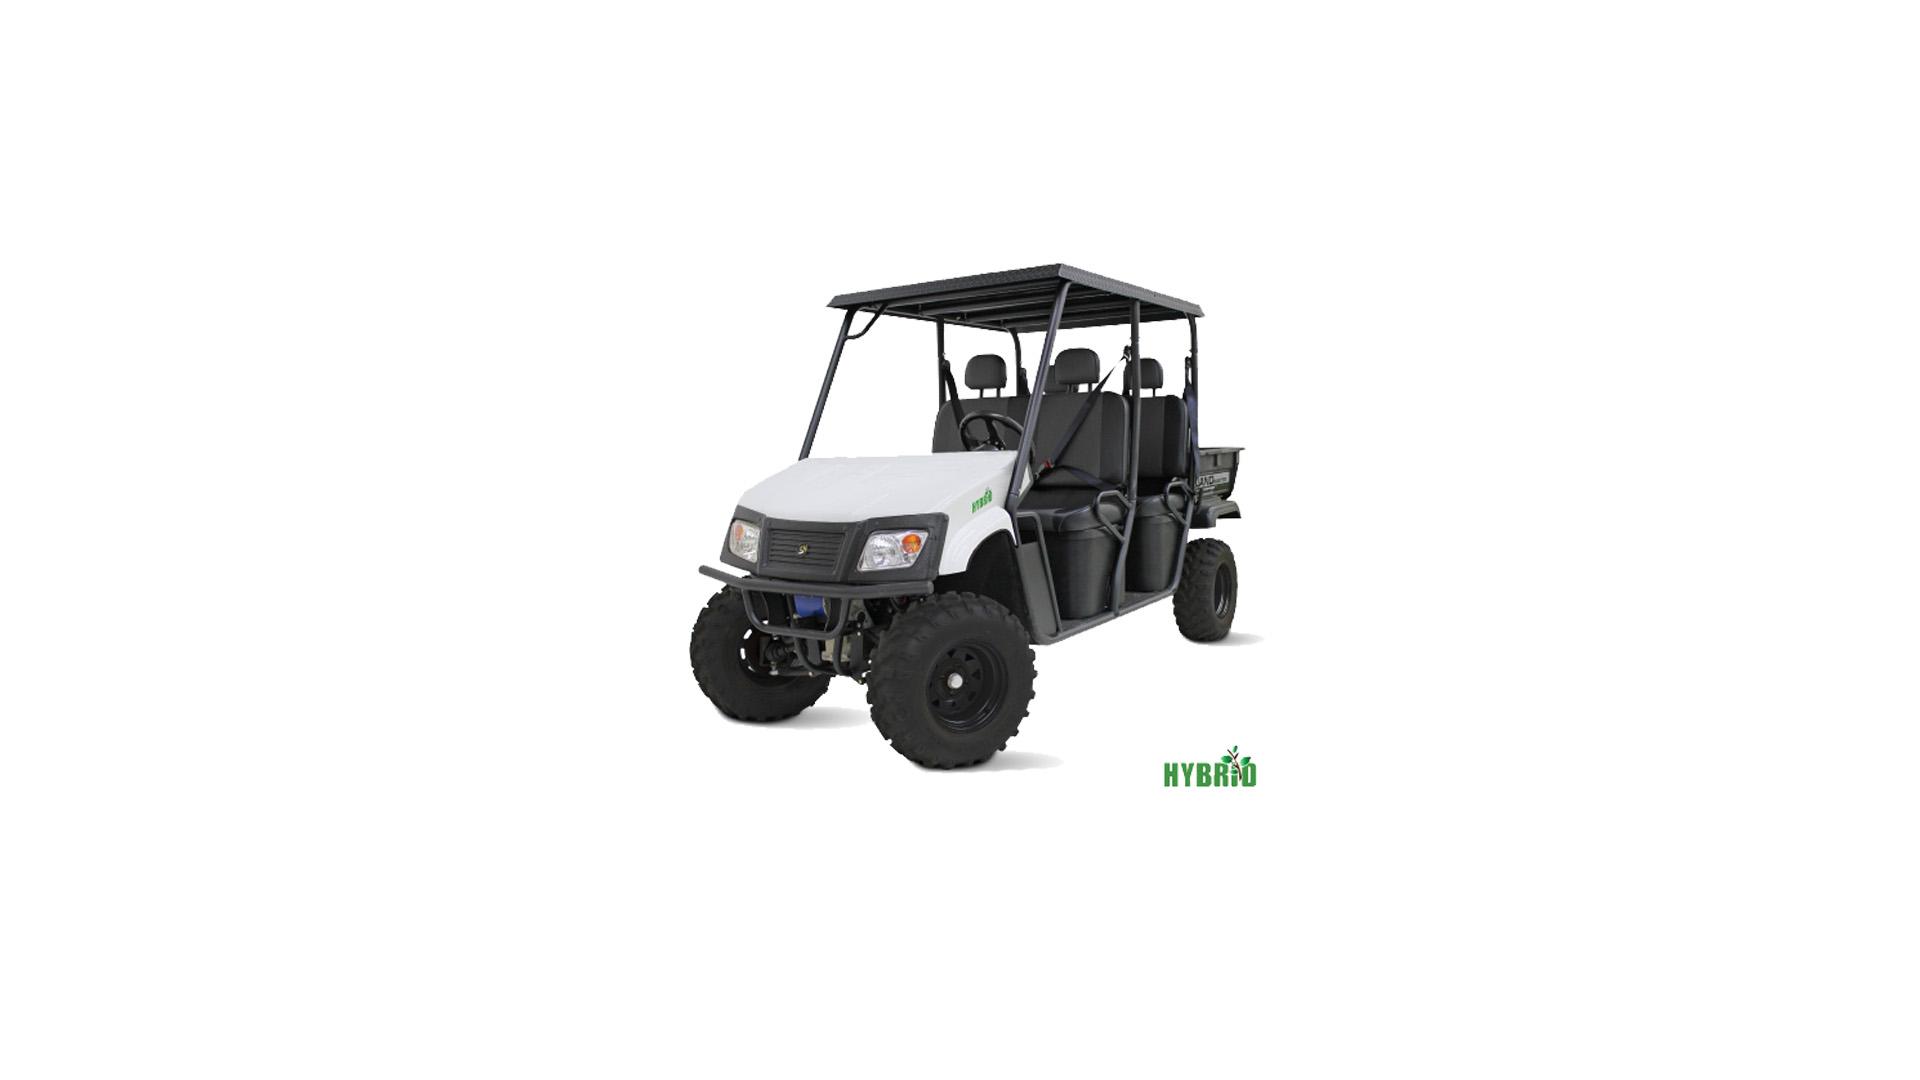 American Sportworks Landmaster UTV – LMC4H Hybrid Crew Cab